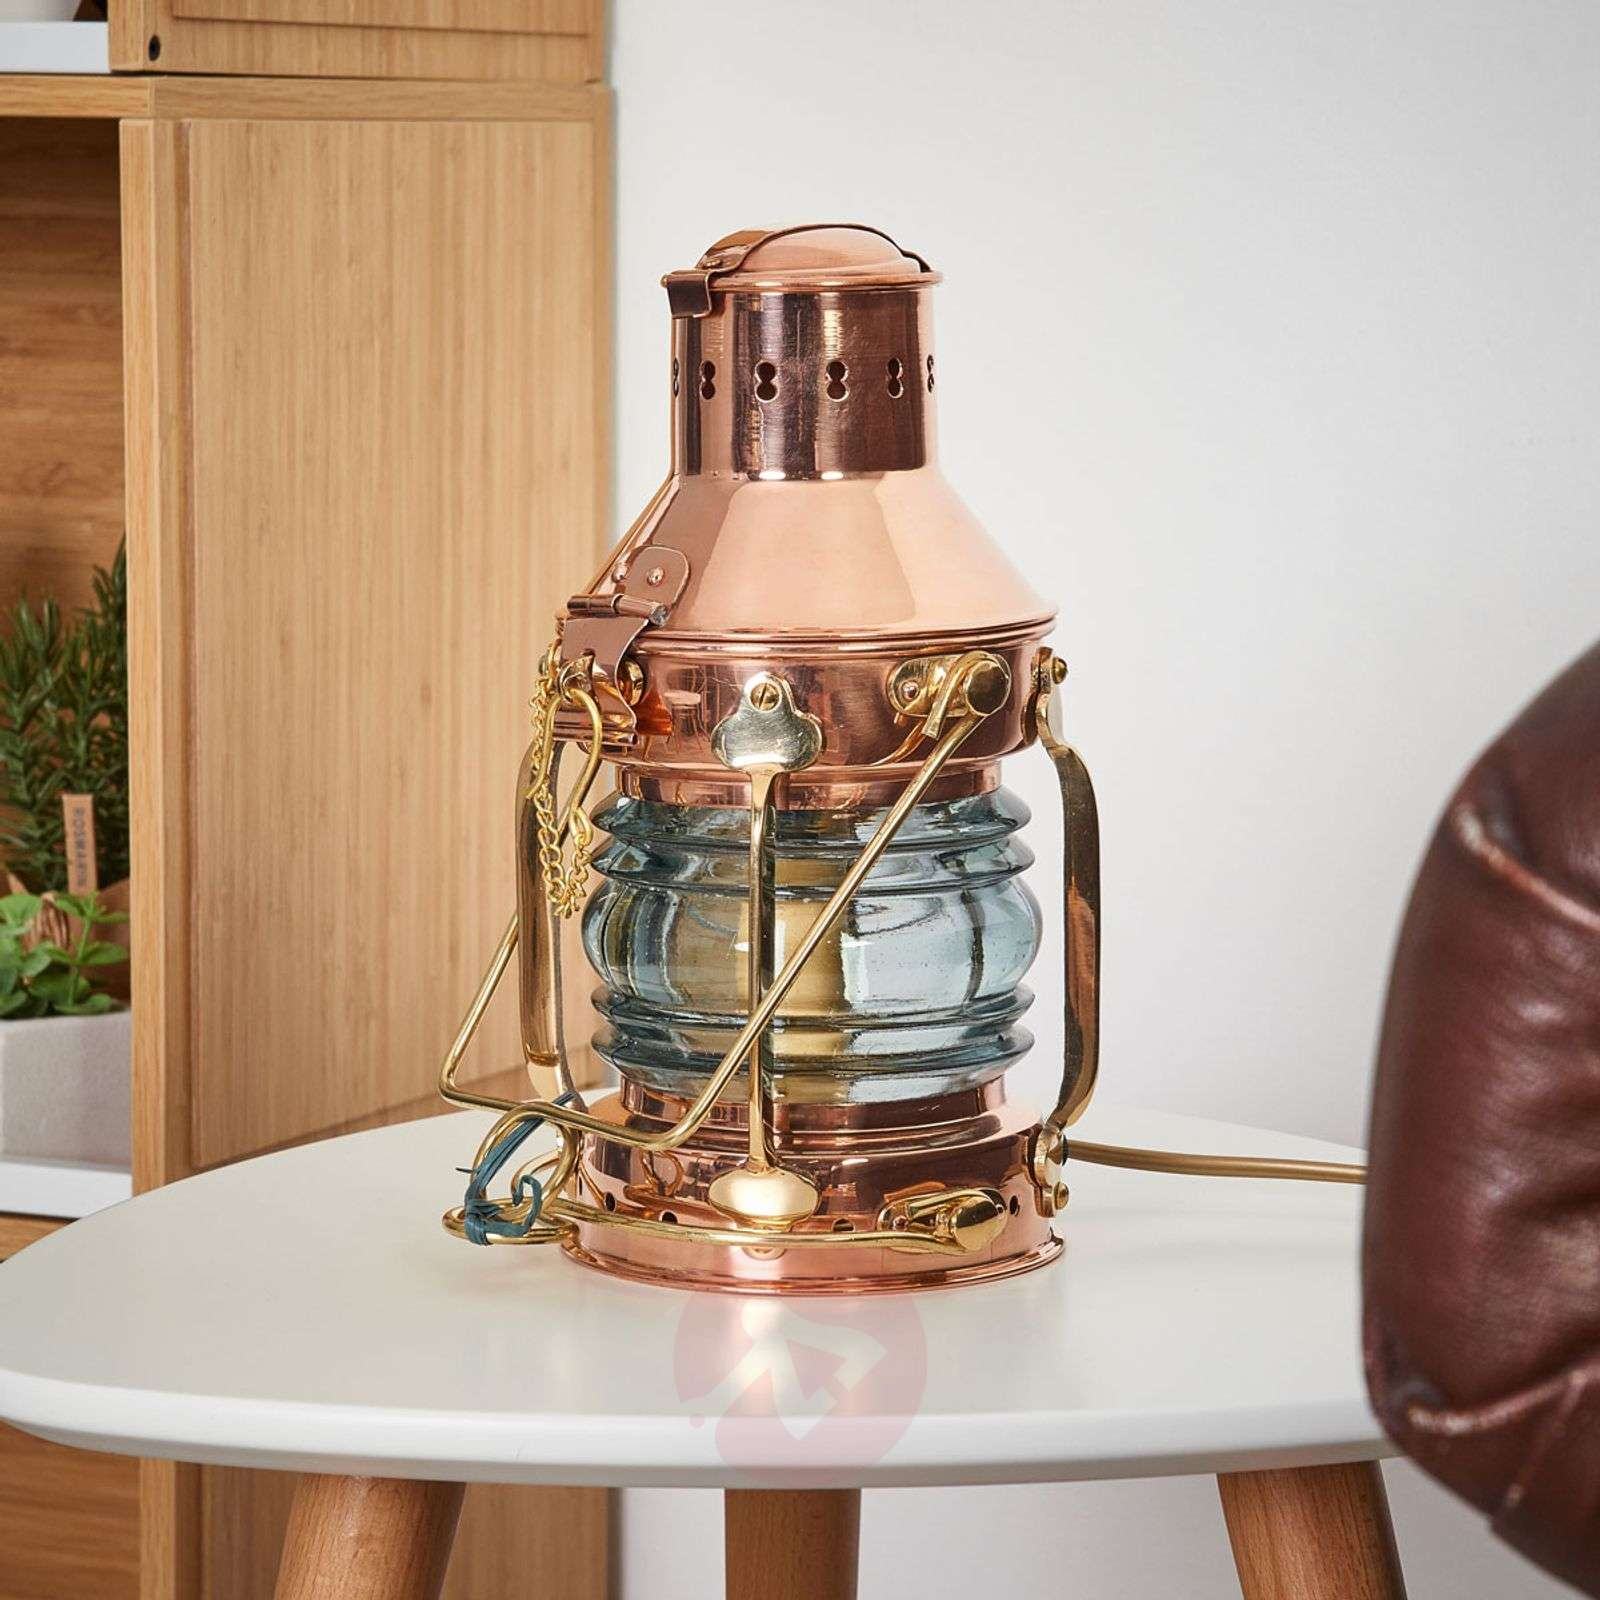 Electric decorative light Anker-8553035X-01